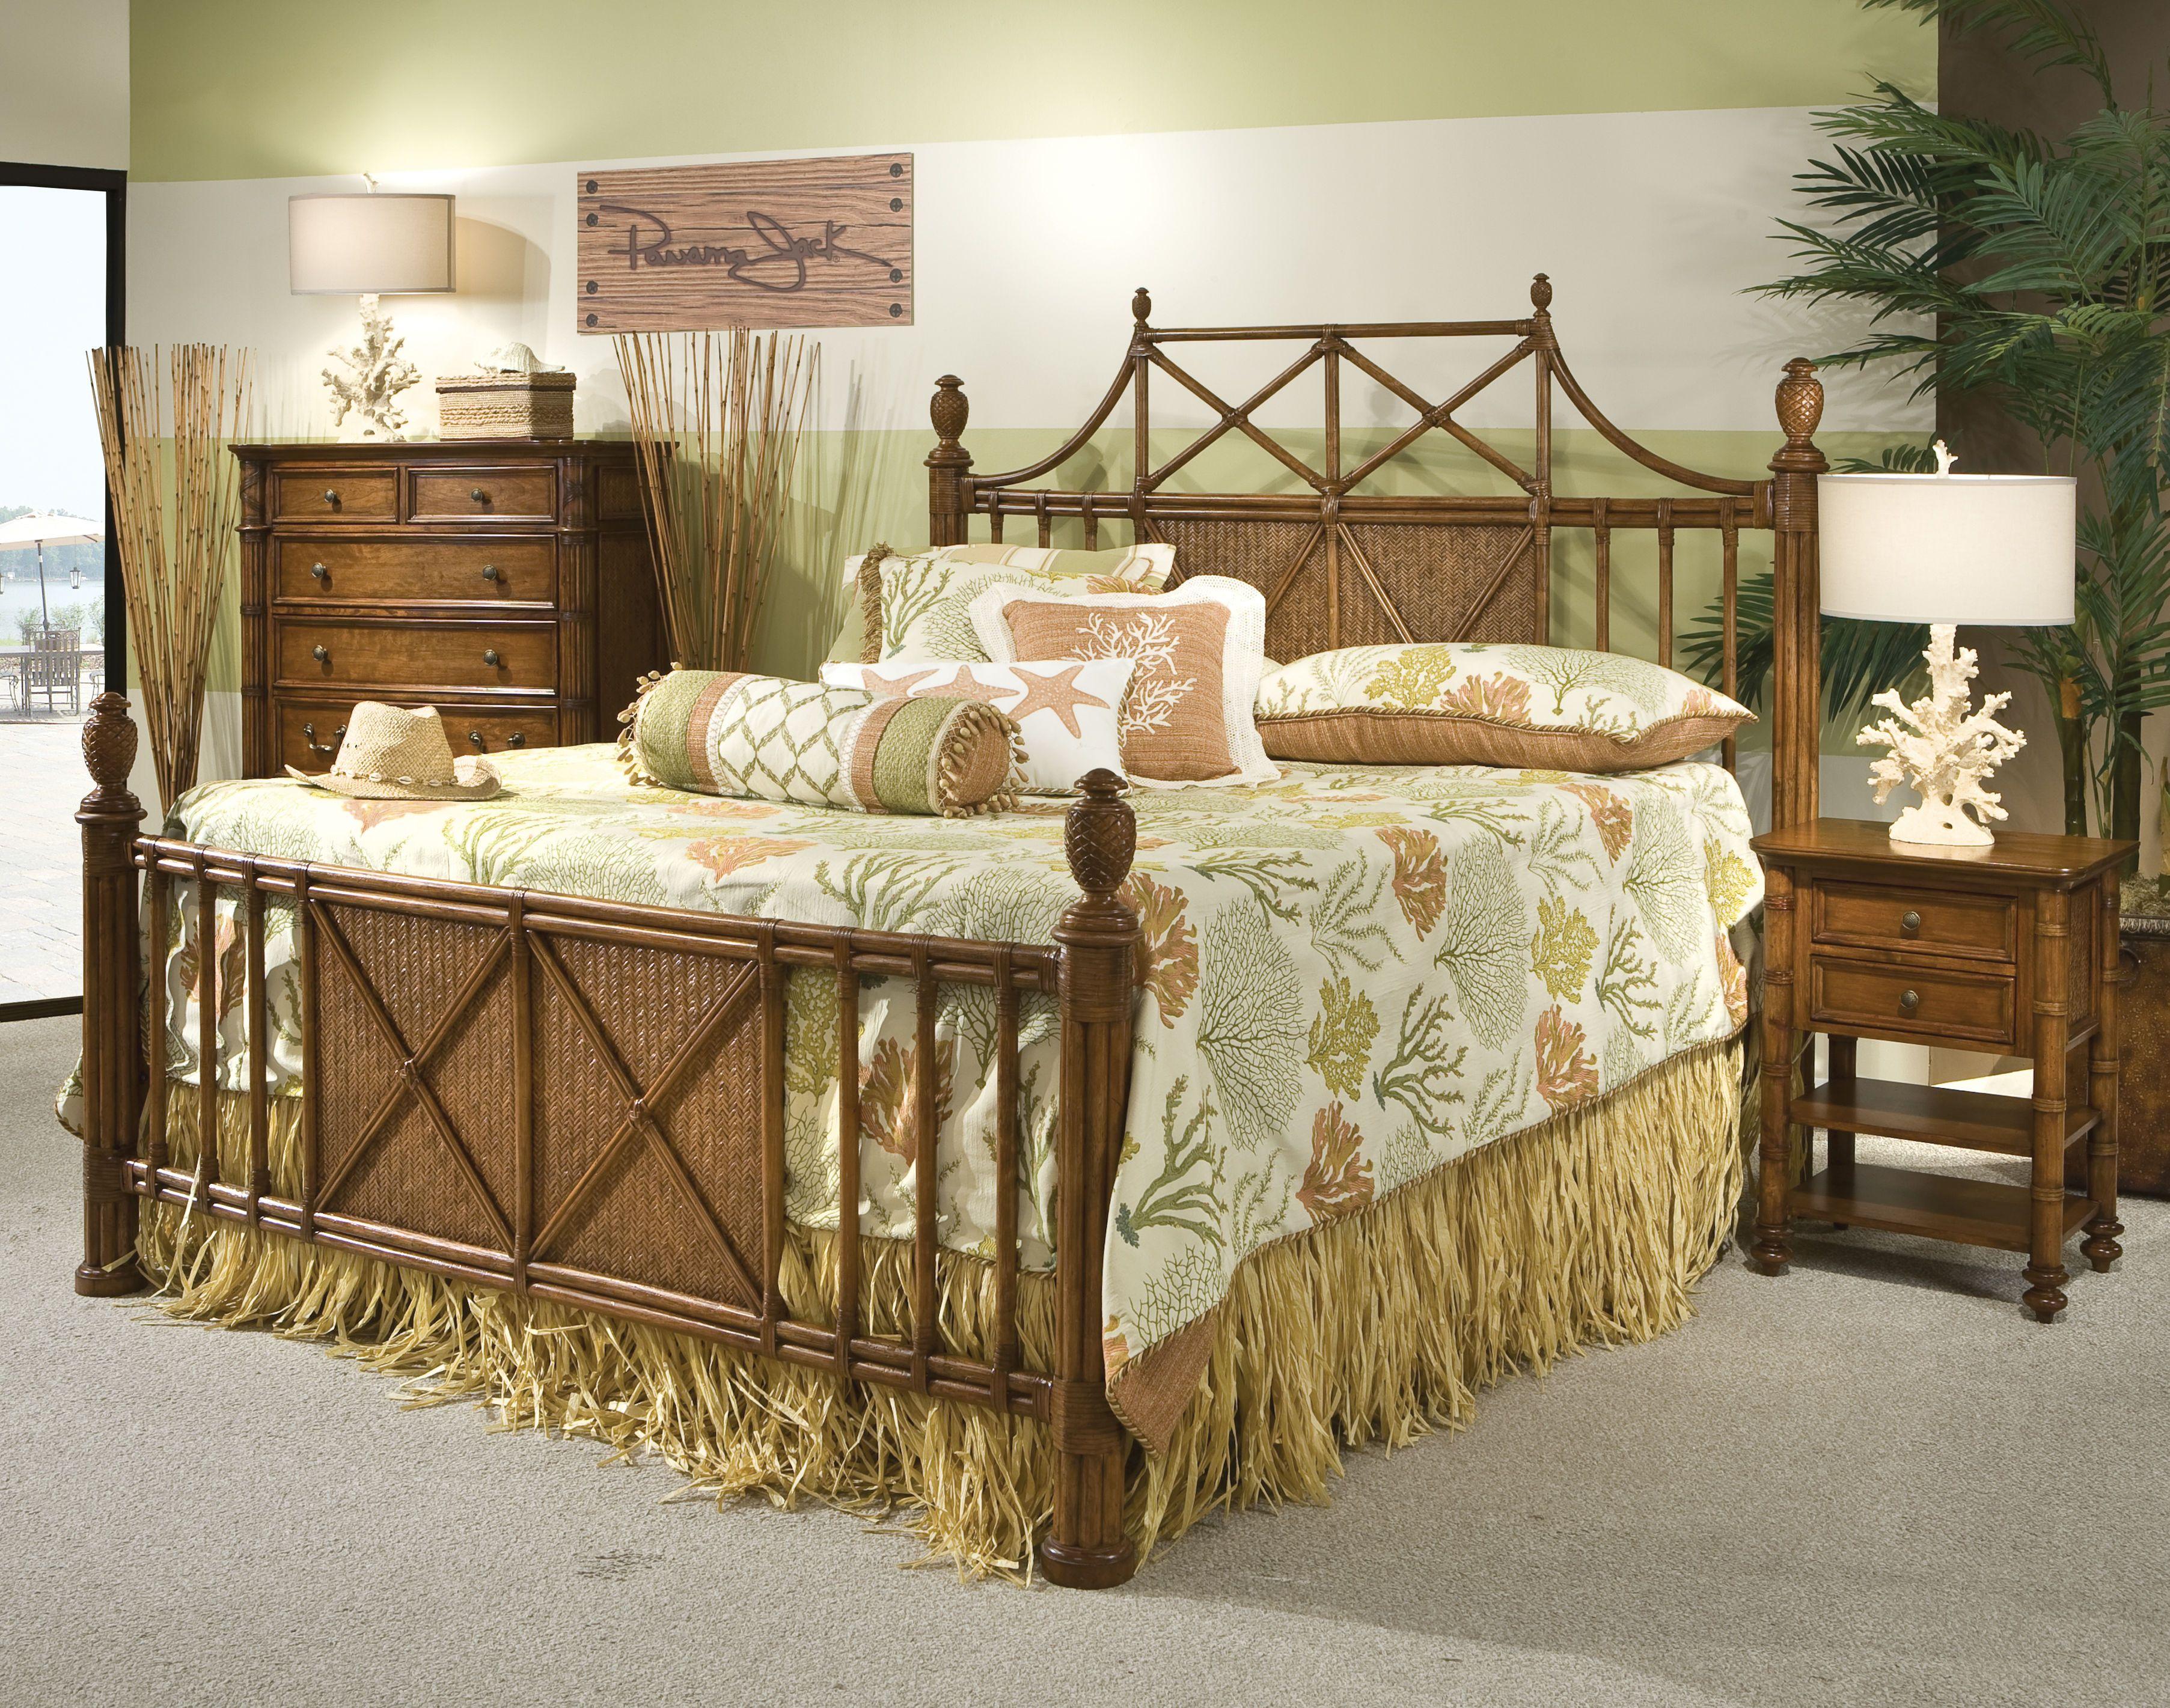 Panama Jack Collections Island Breeze Palmetto Home Tropical - Panama jack bedroom furniture